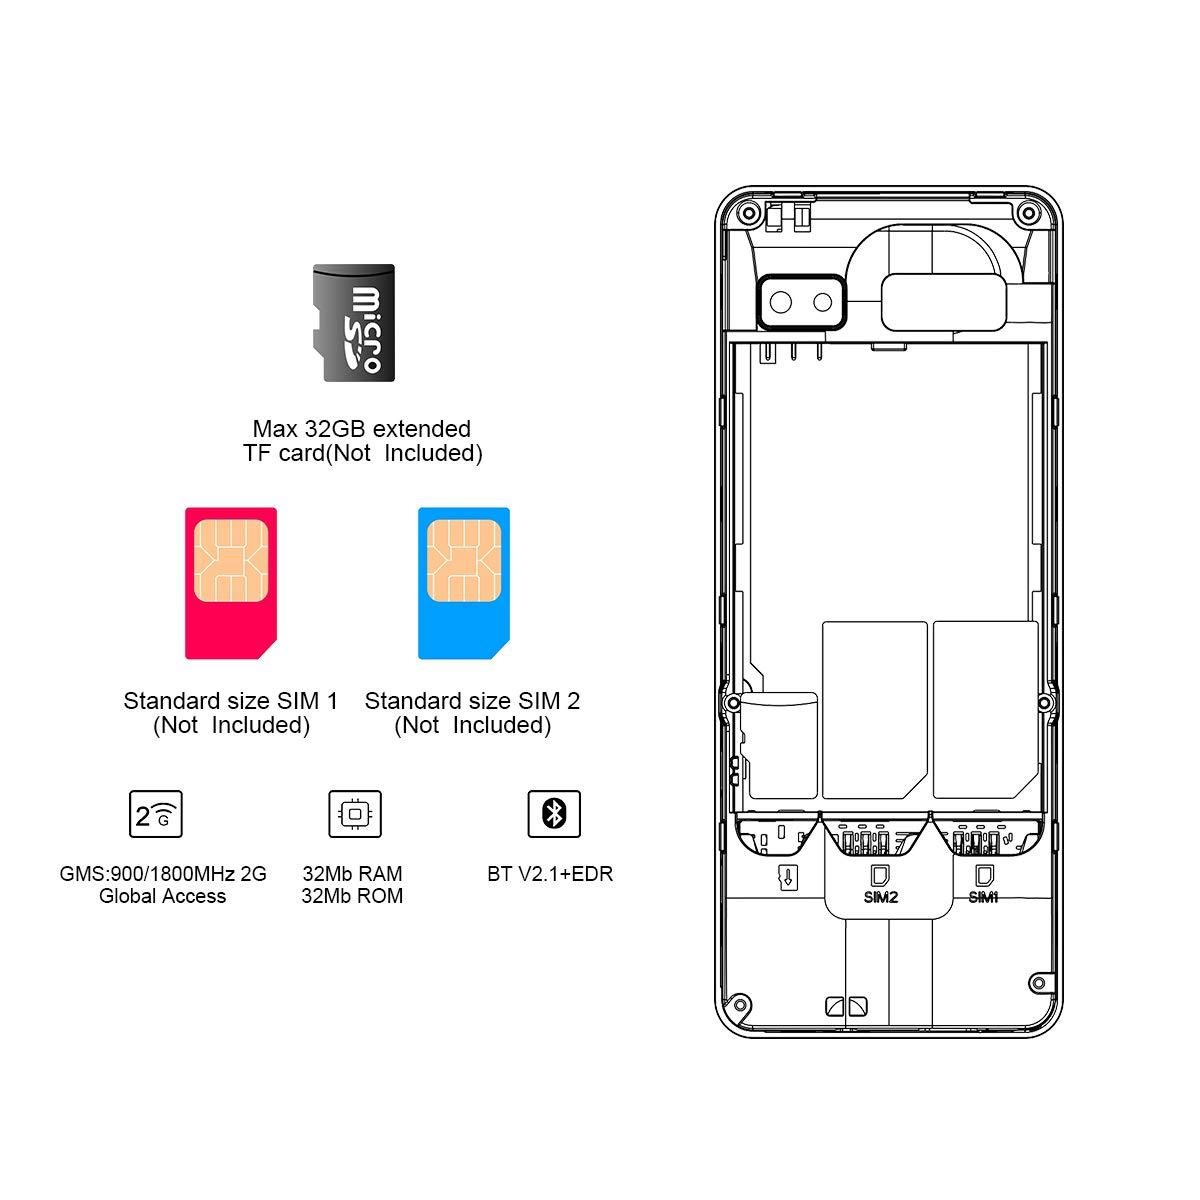 P501 Celulares Simple - Moviles Buenos con 2.4 Pulgadas, Doble SIM, Radio, Telefono Movil Basico Teclas con Physical Keyboard, LED Flashlight, Bluetooth, 1750mAh(Oro Negro)